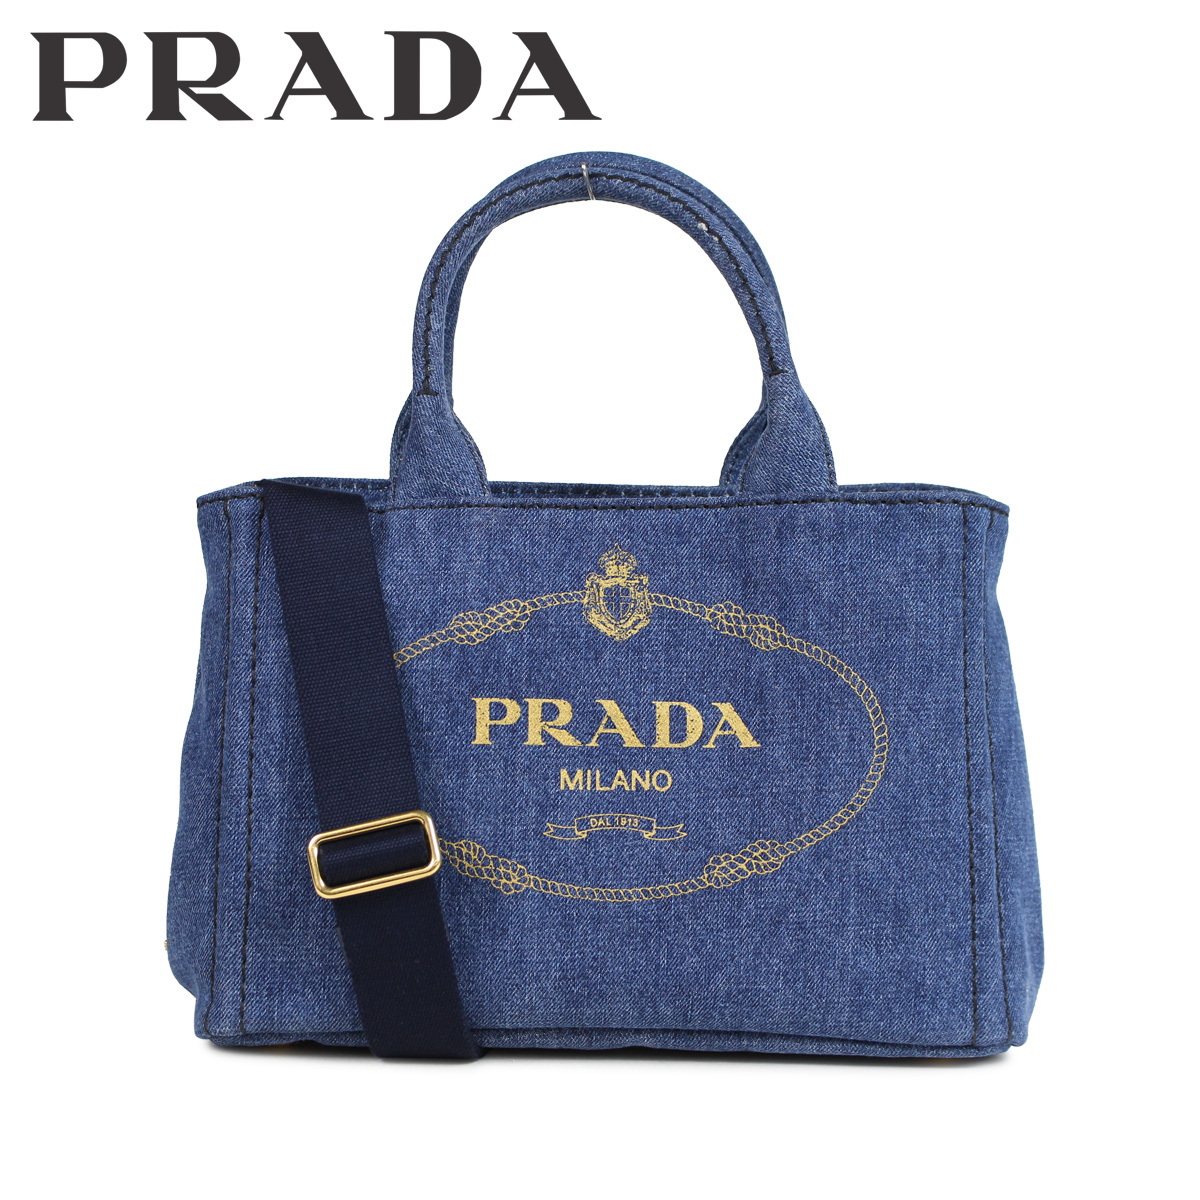 PRADA CANAPA プラダ バッグ トートバッグ ショルダー カナパ レディース 2WAY デニム ブルー 1BG439V 0Y0AJ6 F0008